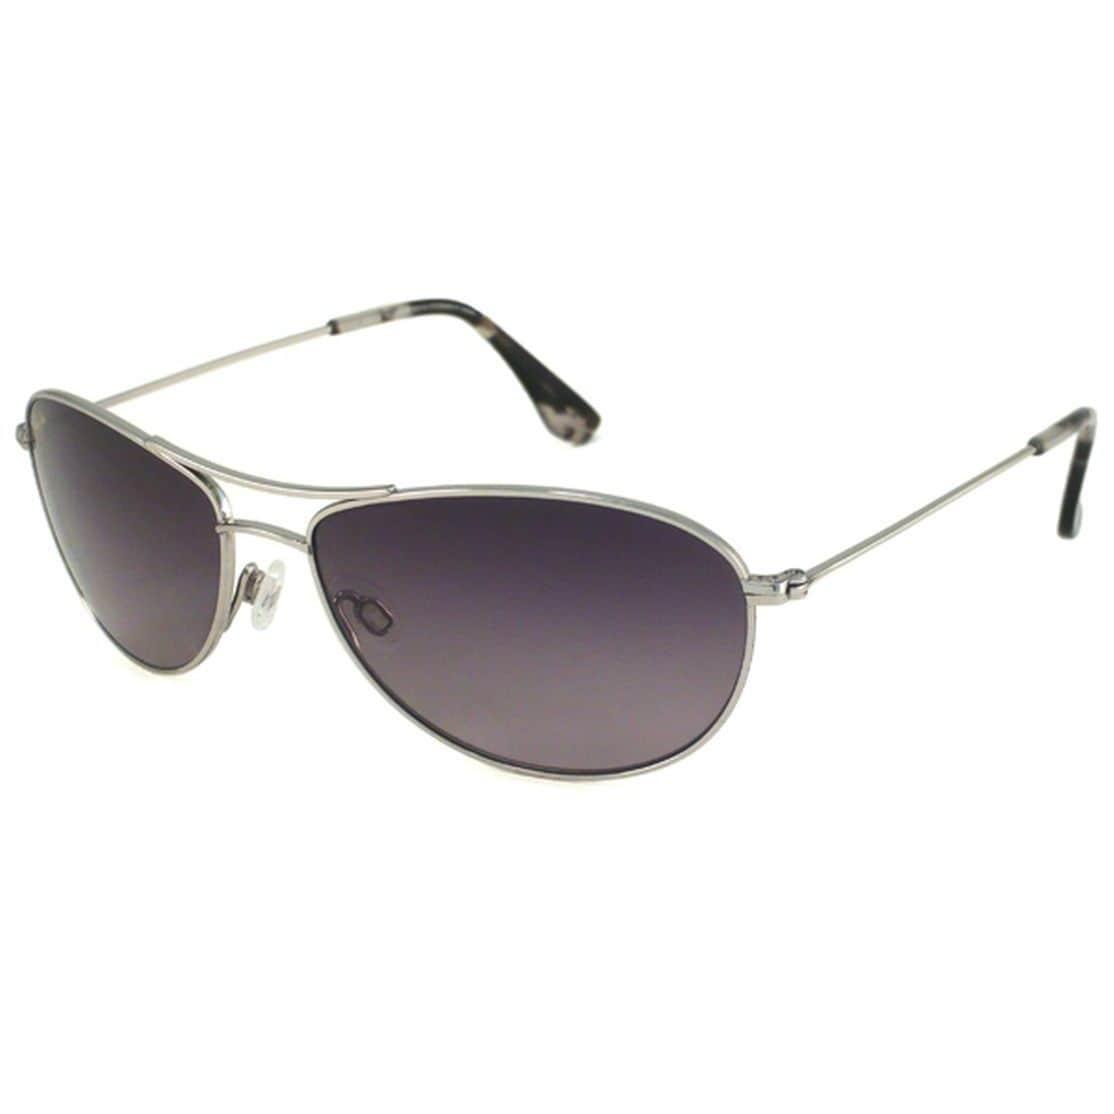 Maui Jim Unisex Baby Beach Gs245 17 Silver Titanium Polarized Aviator Sunglasses